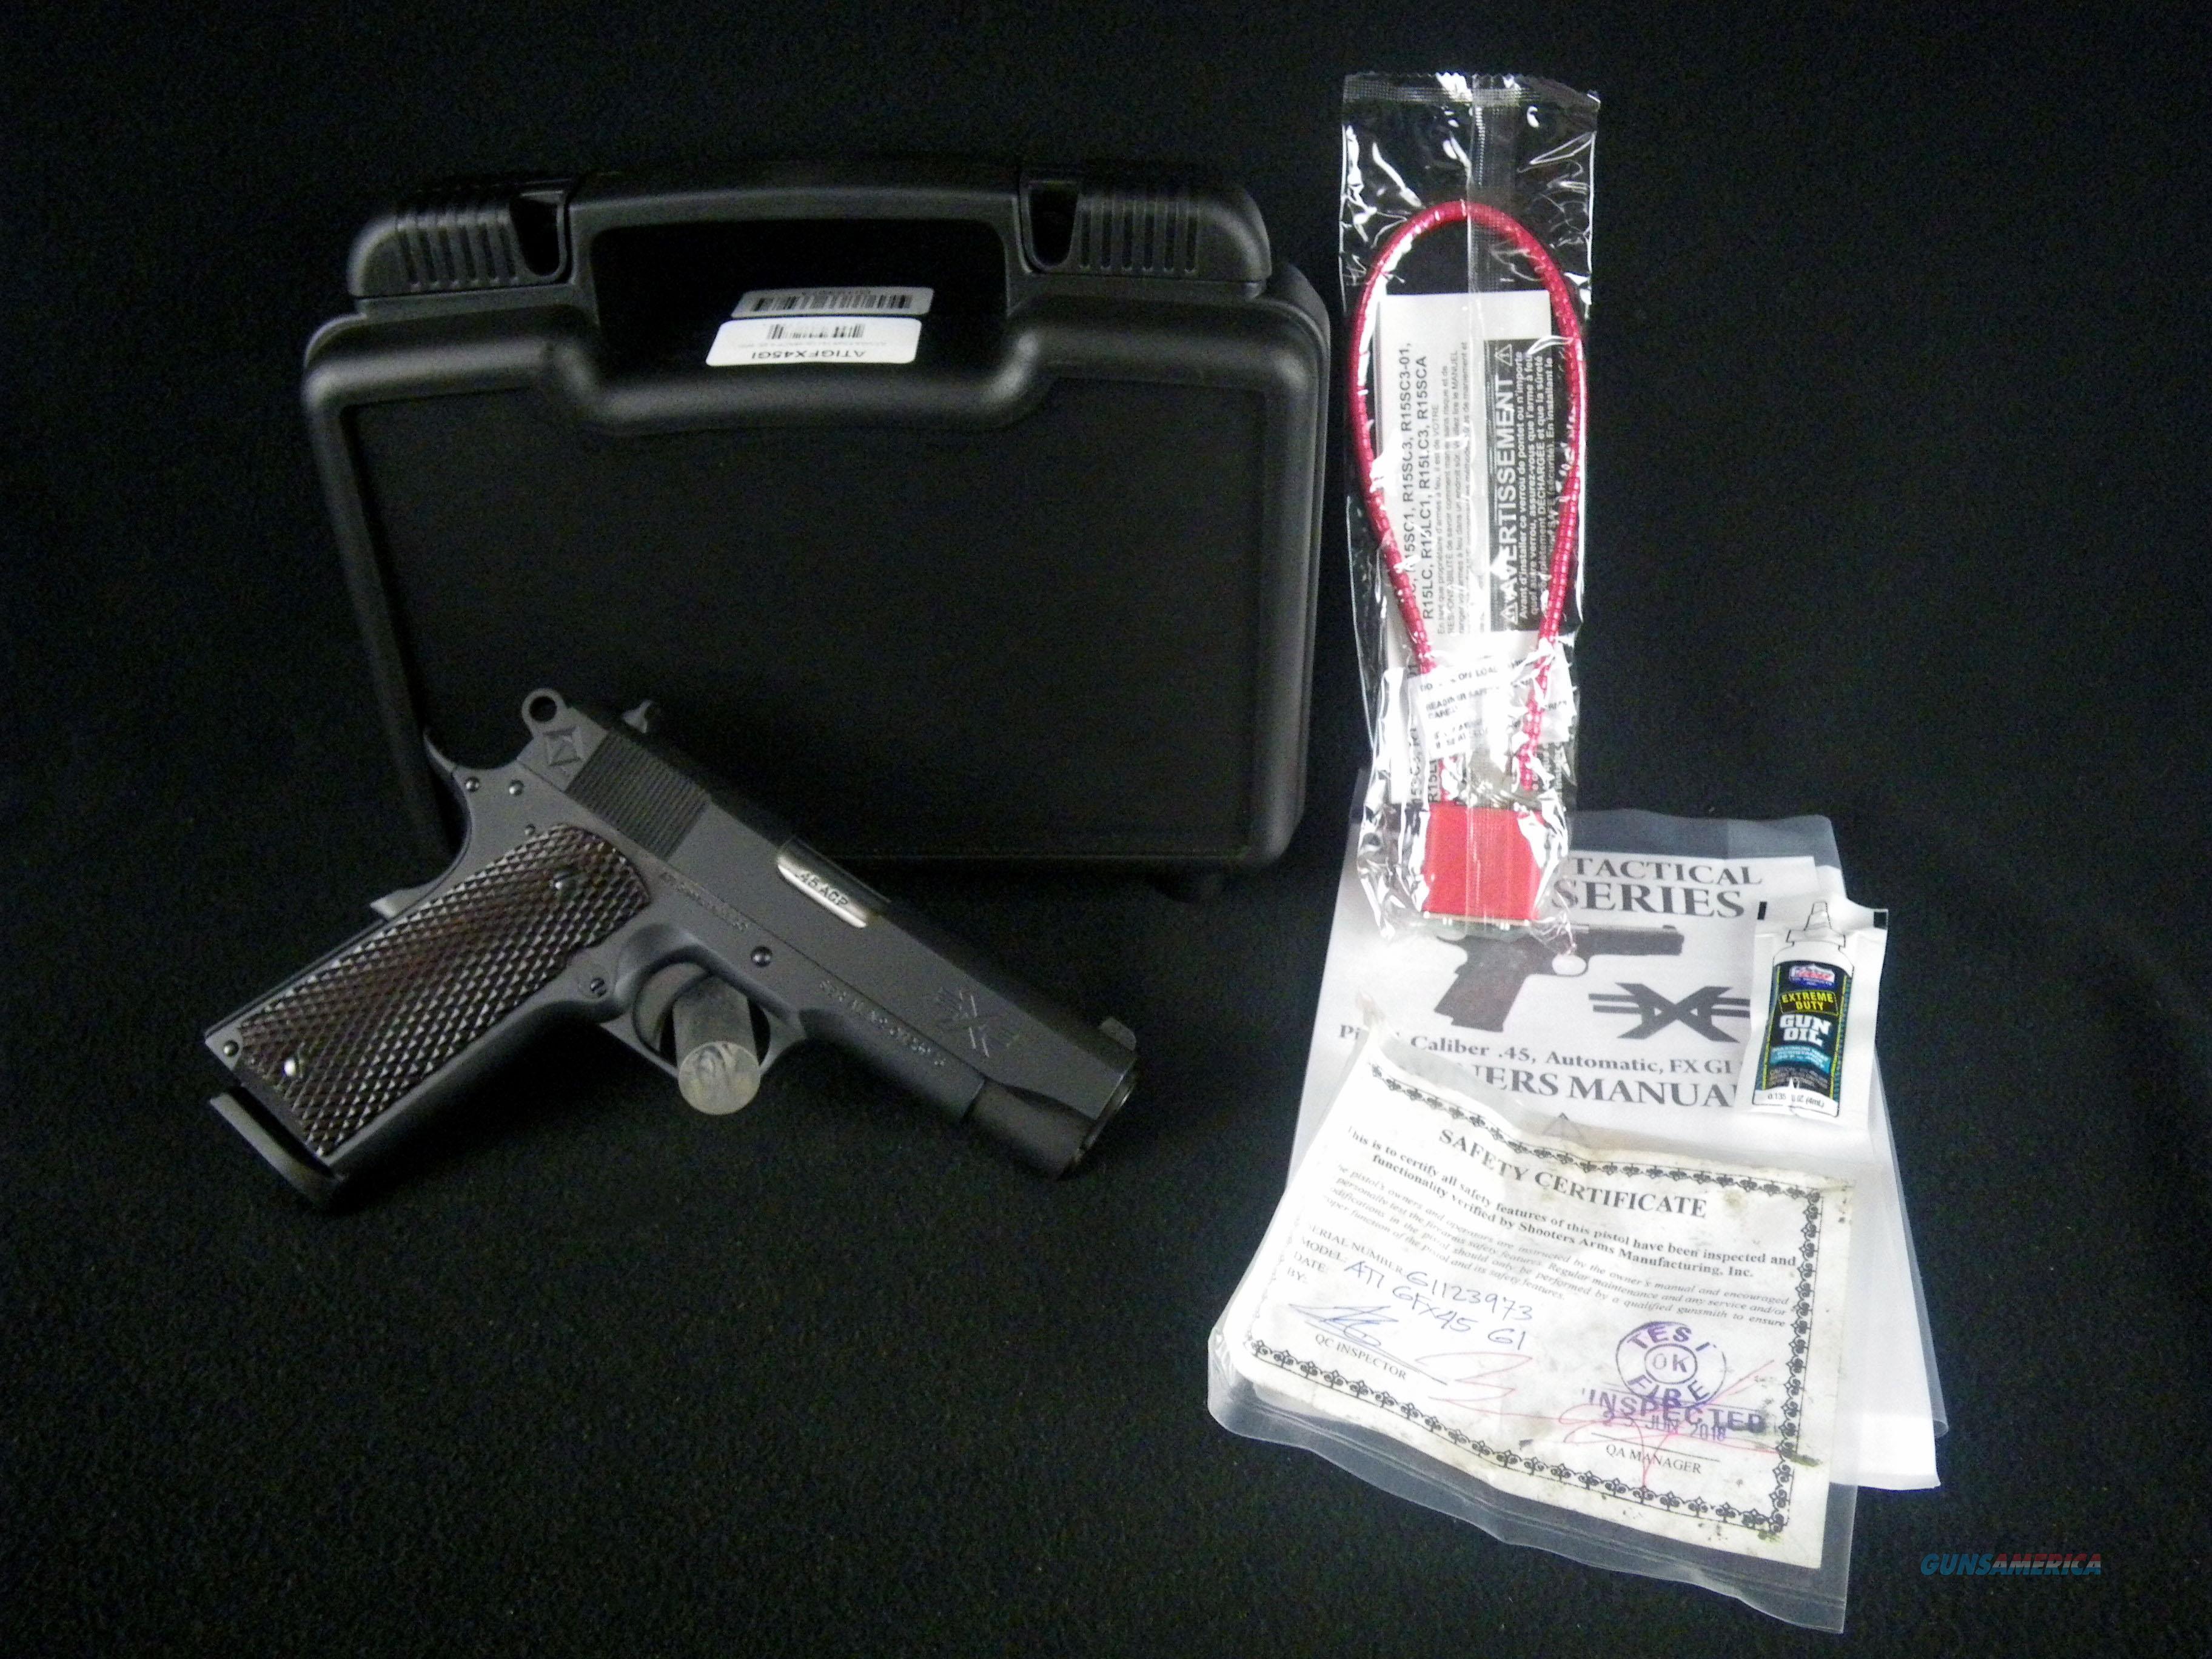 "ATI GI 1911 Firepower Xtreme 45ACP 4.25"" Wood NEW ATIGFX45GI  Guns > Pistols > American Tactical Imports Pistols"